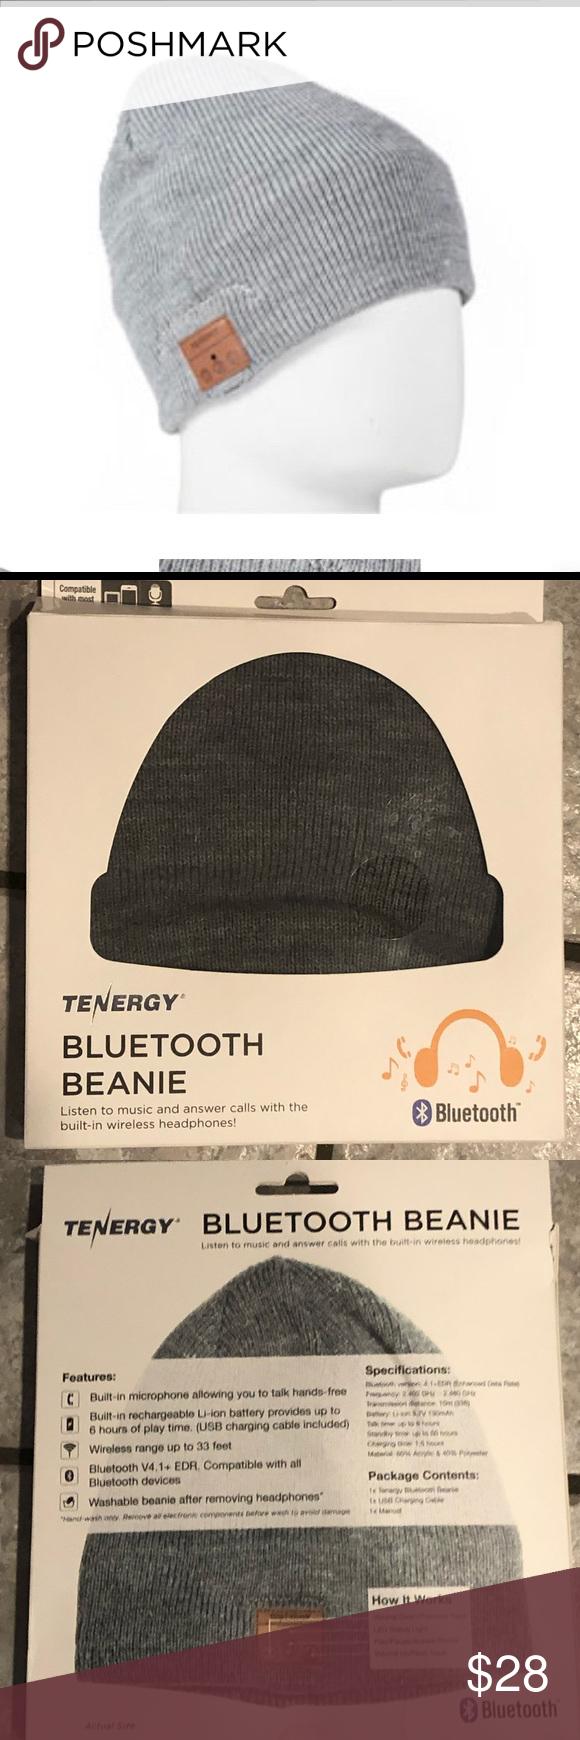 1c6871e45 NIB Tenergy Bluetooth Beanie NWT in 2019 | My Posh Picks